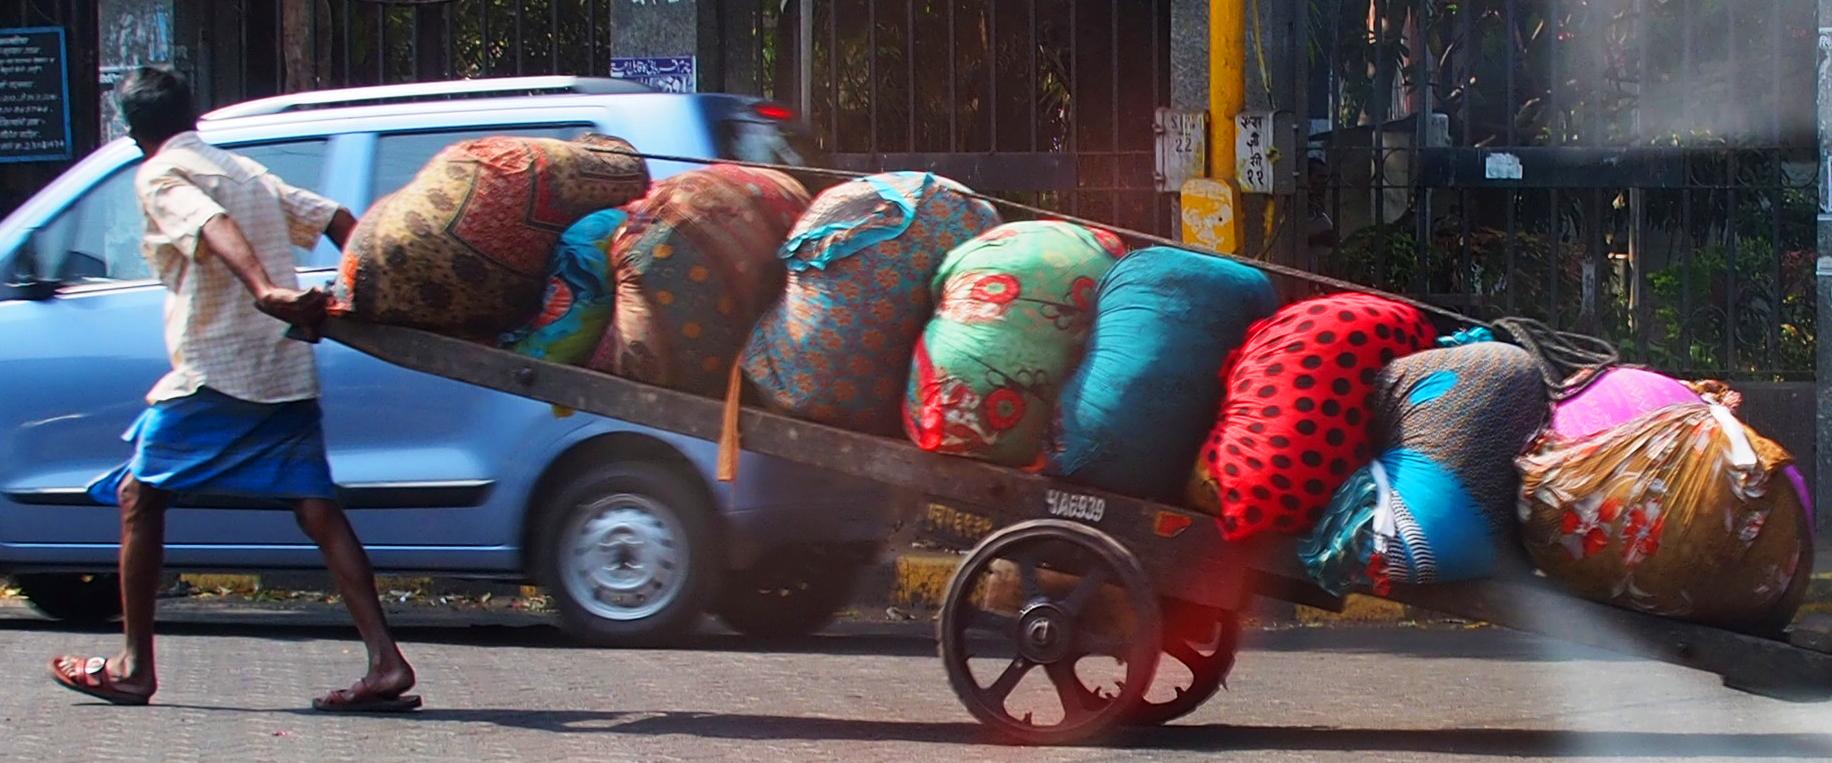 transporting goods in Mumbai